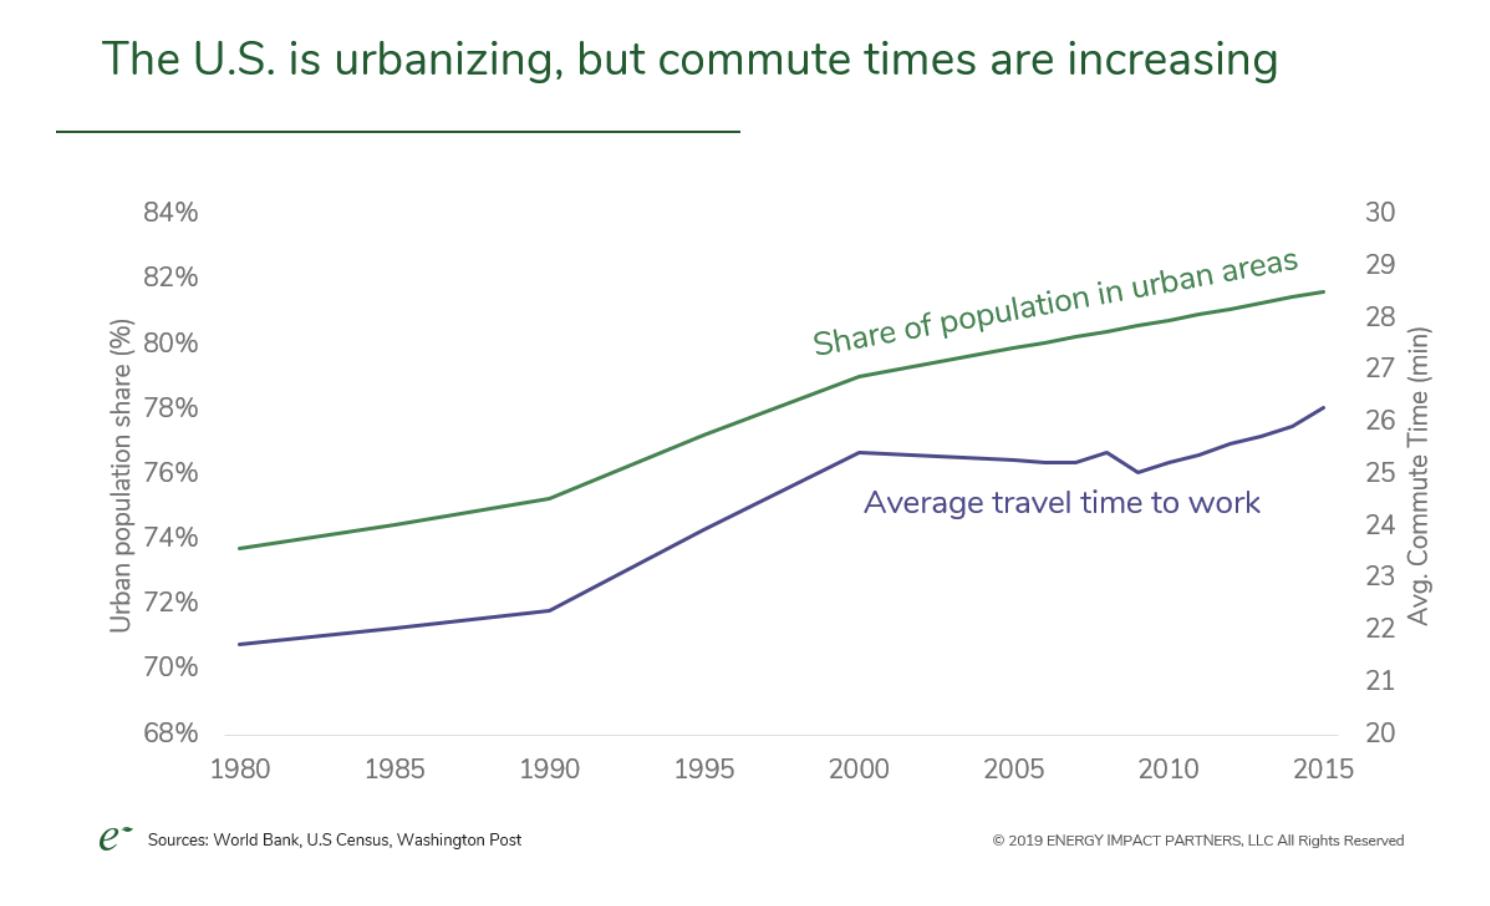 Urbanization Data